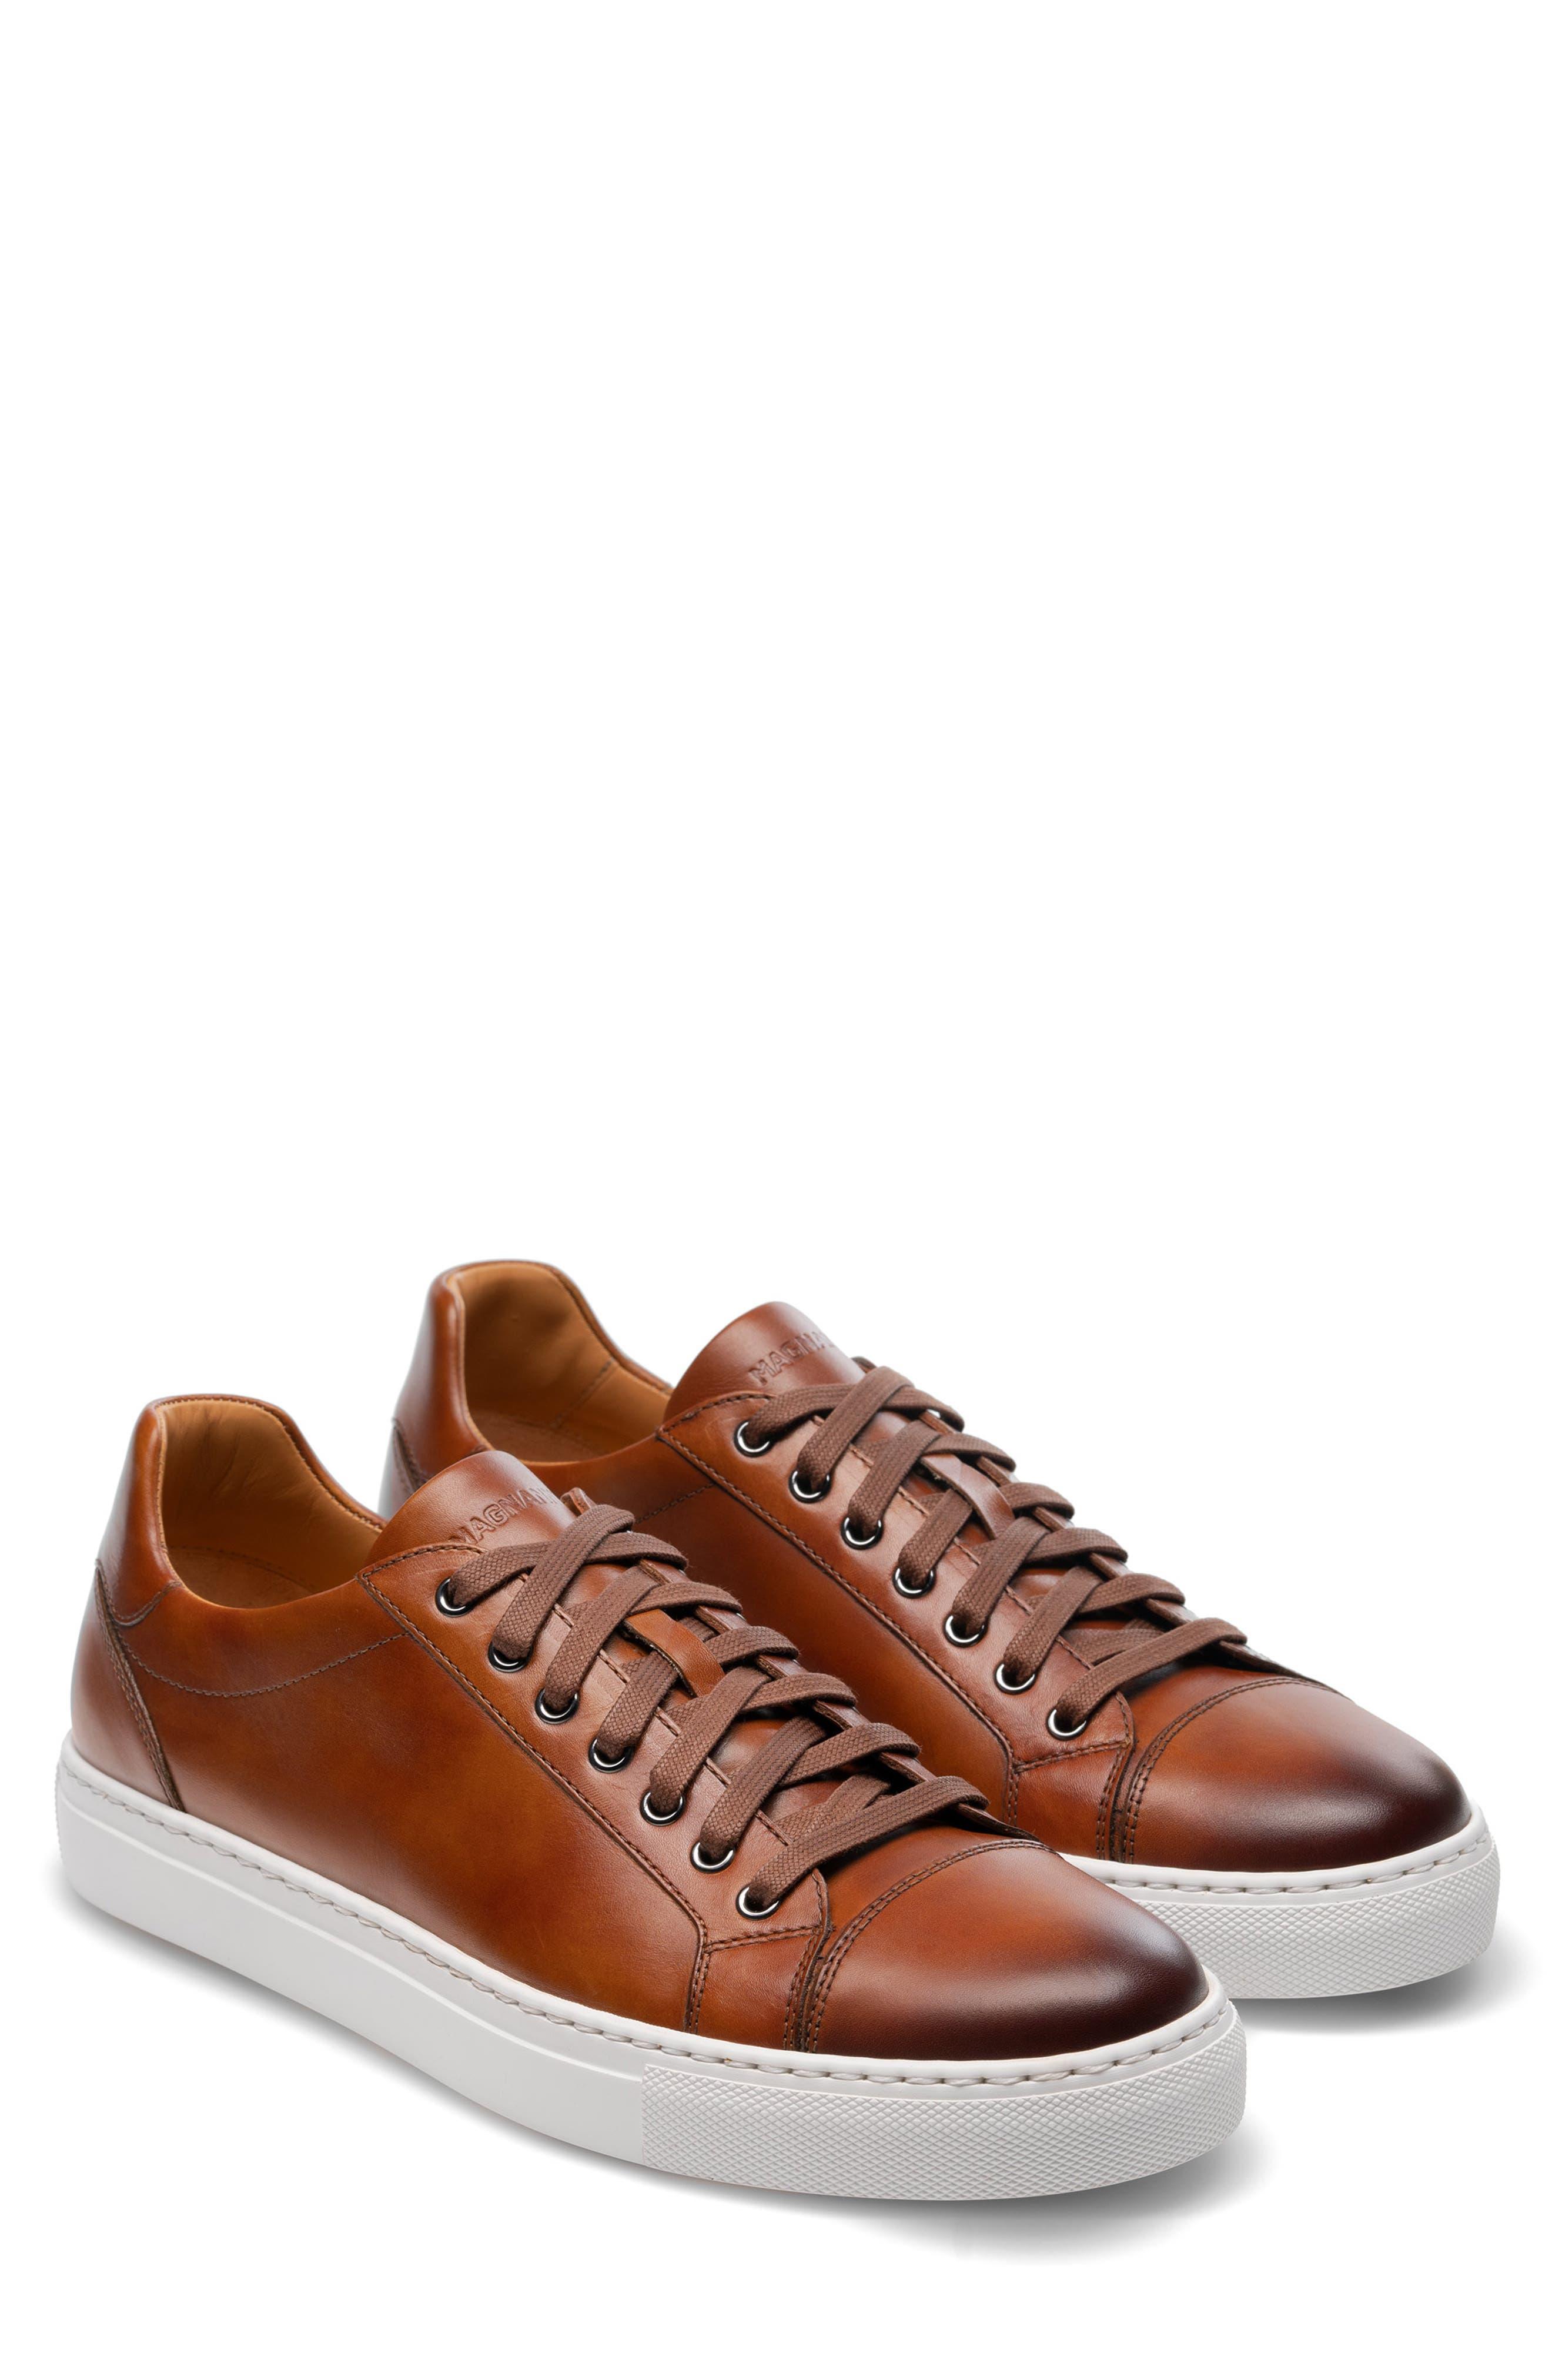 Men's Magnanni Shoes | Nordstrom